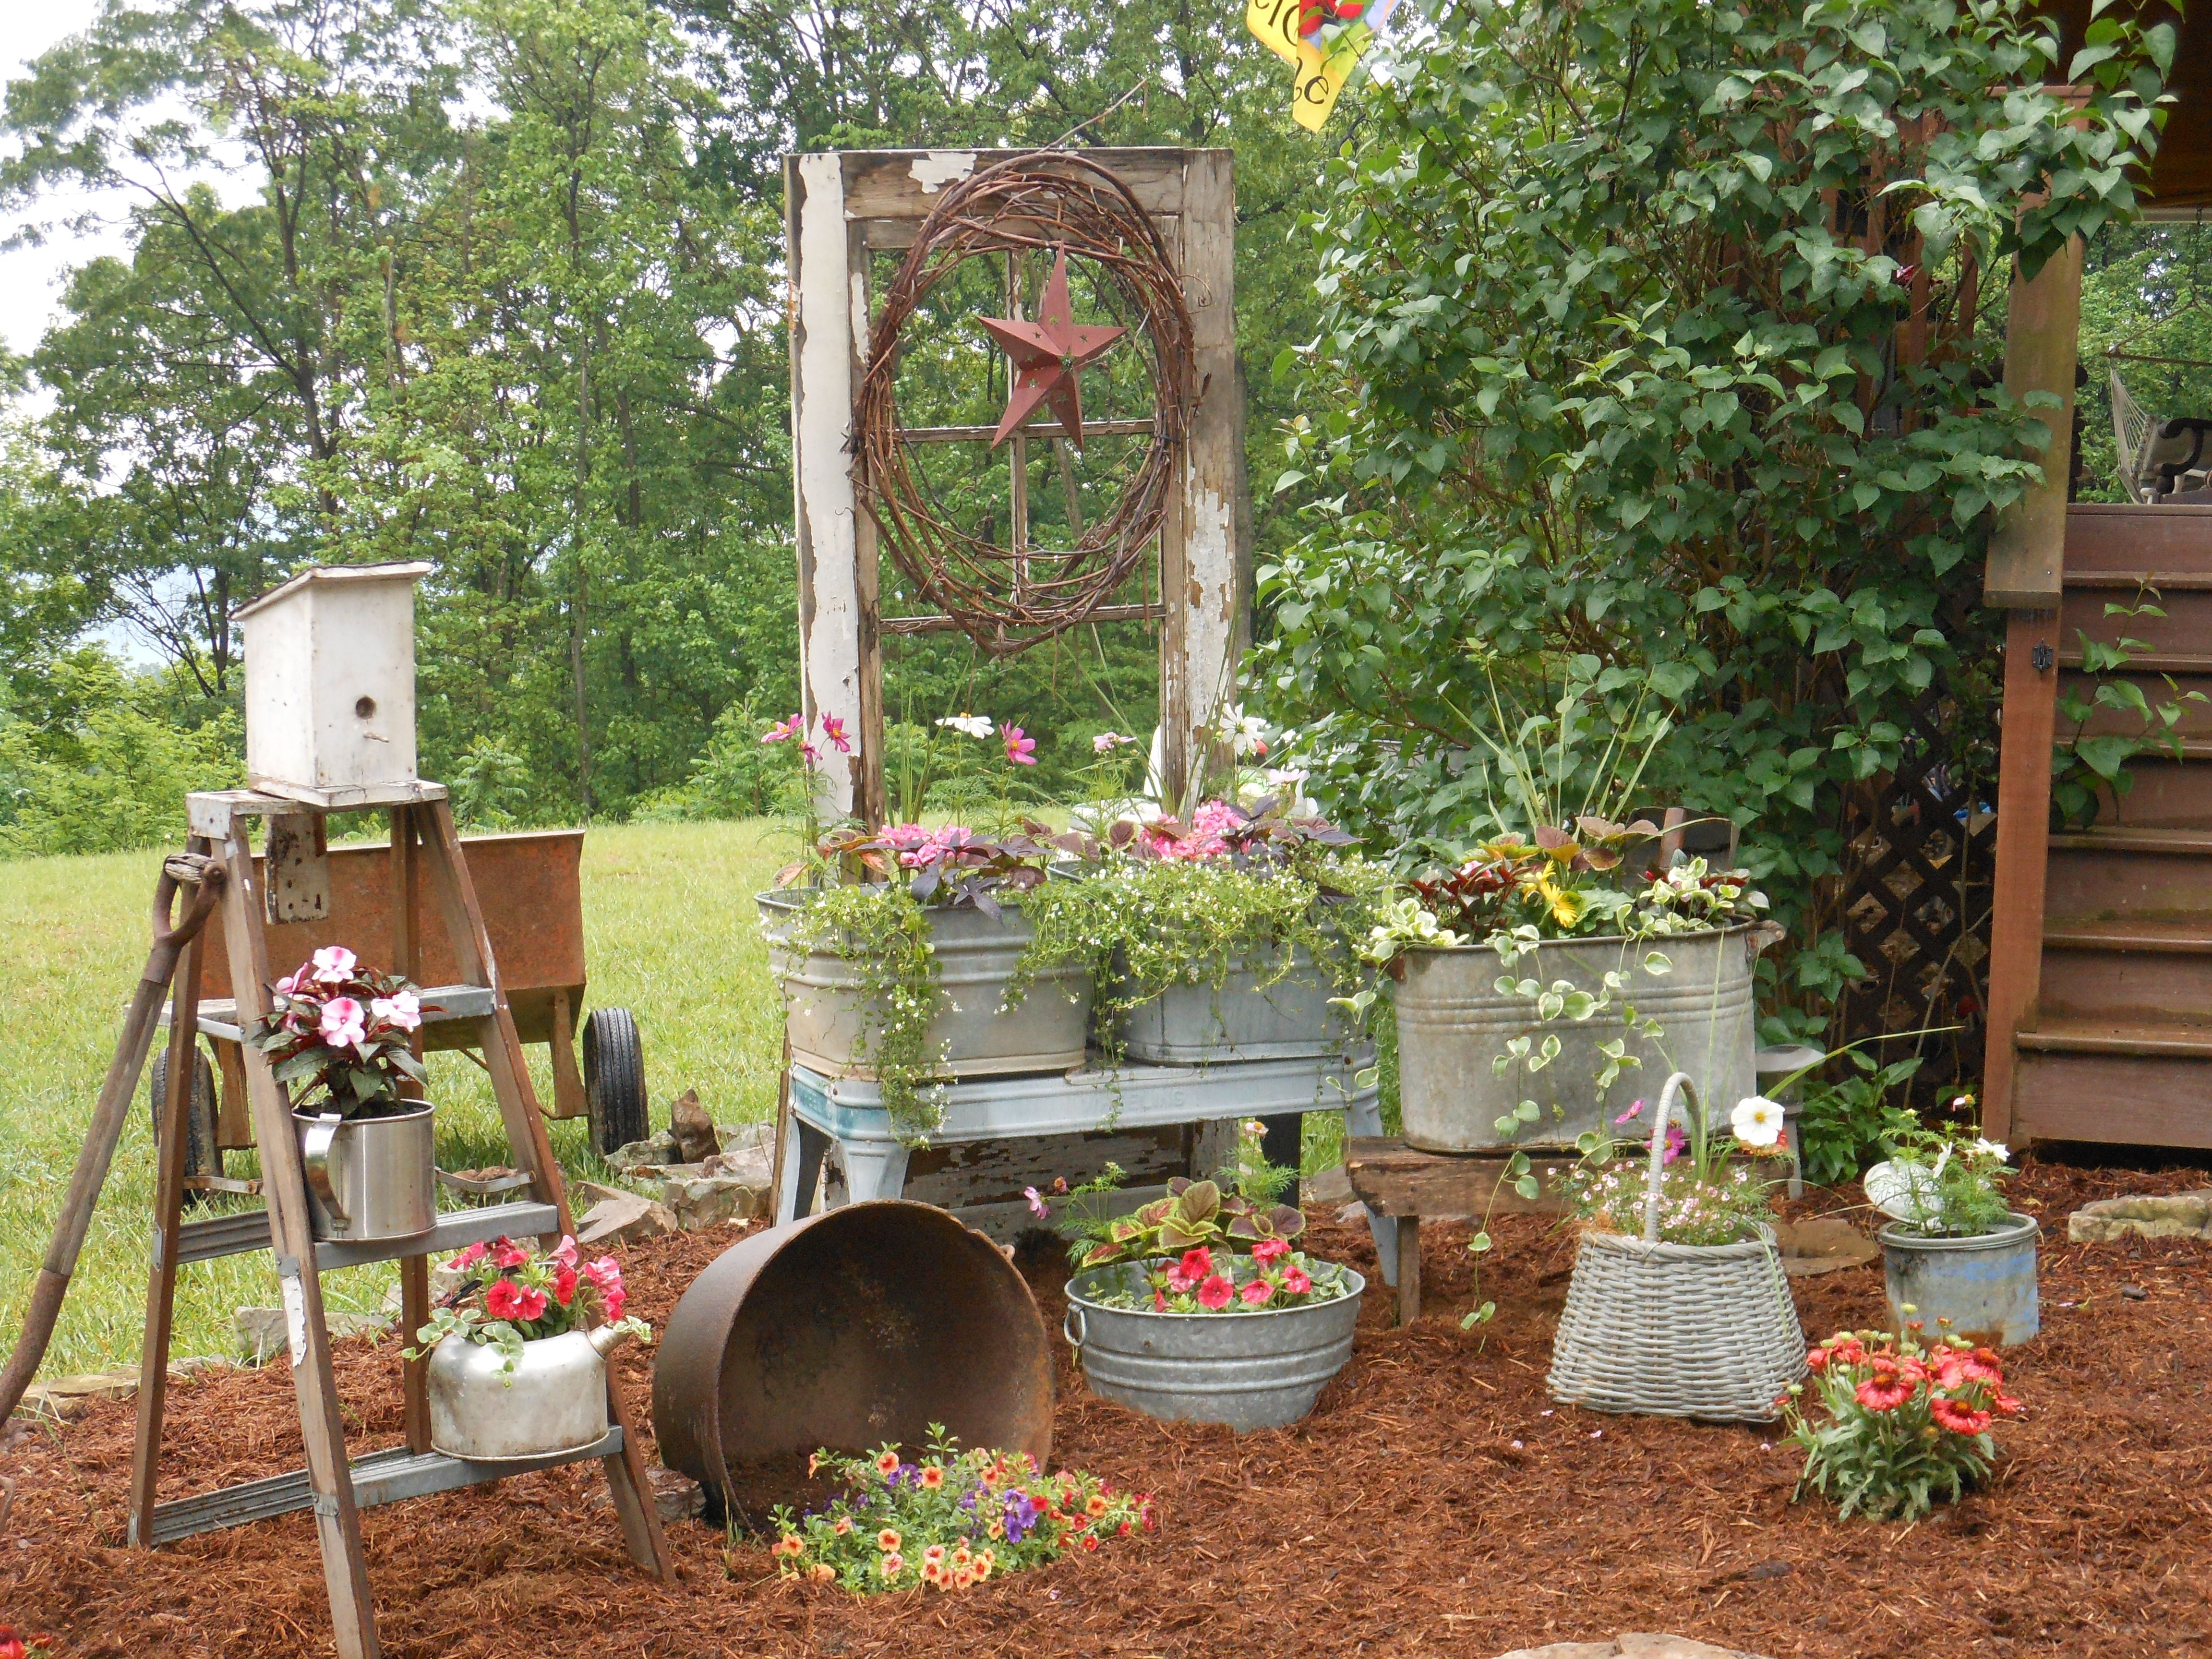 Original flowerbed from the wheel for garden decoration